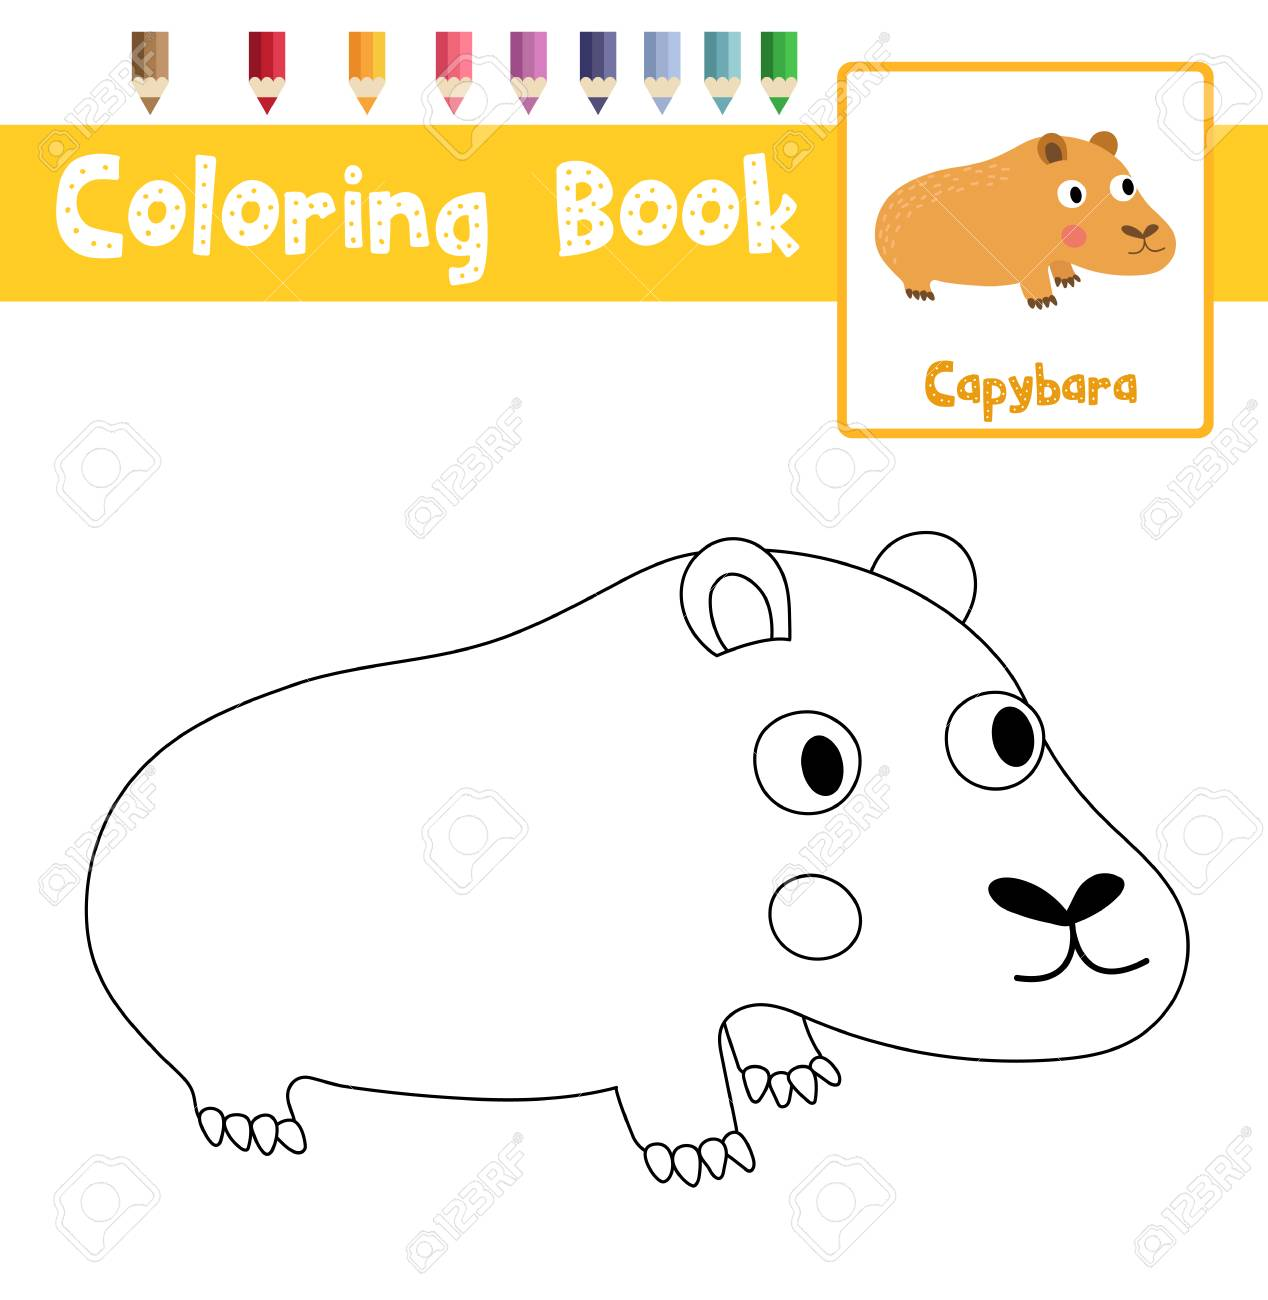 Coloring Page Of Capybara Animals For Preschool Kids Activity ...